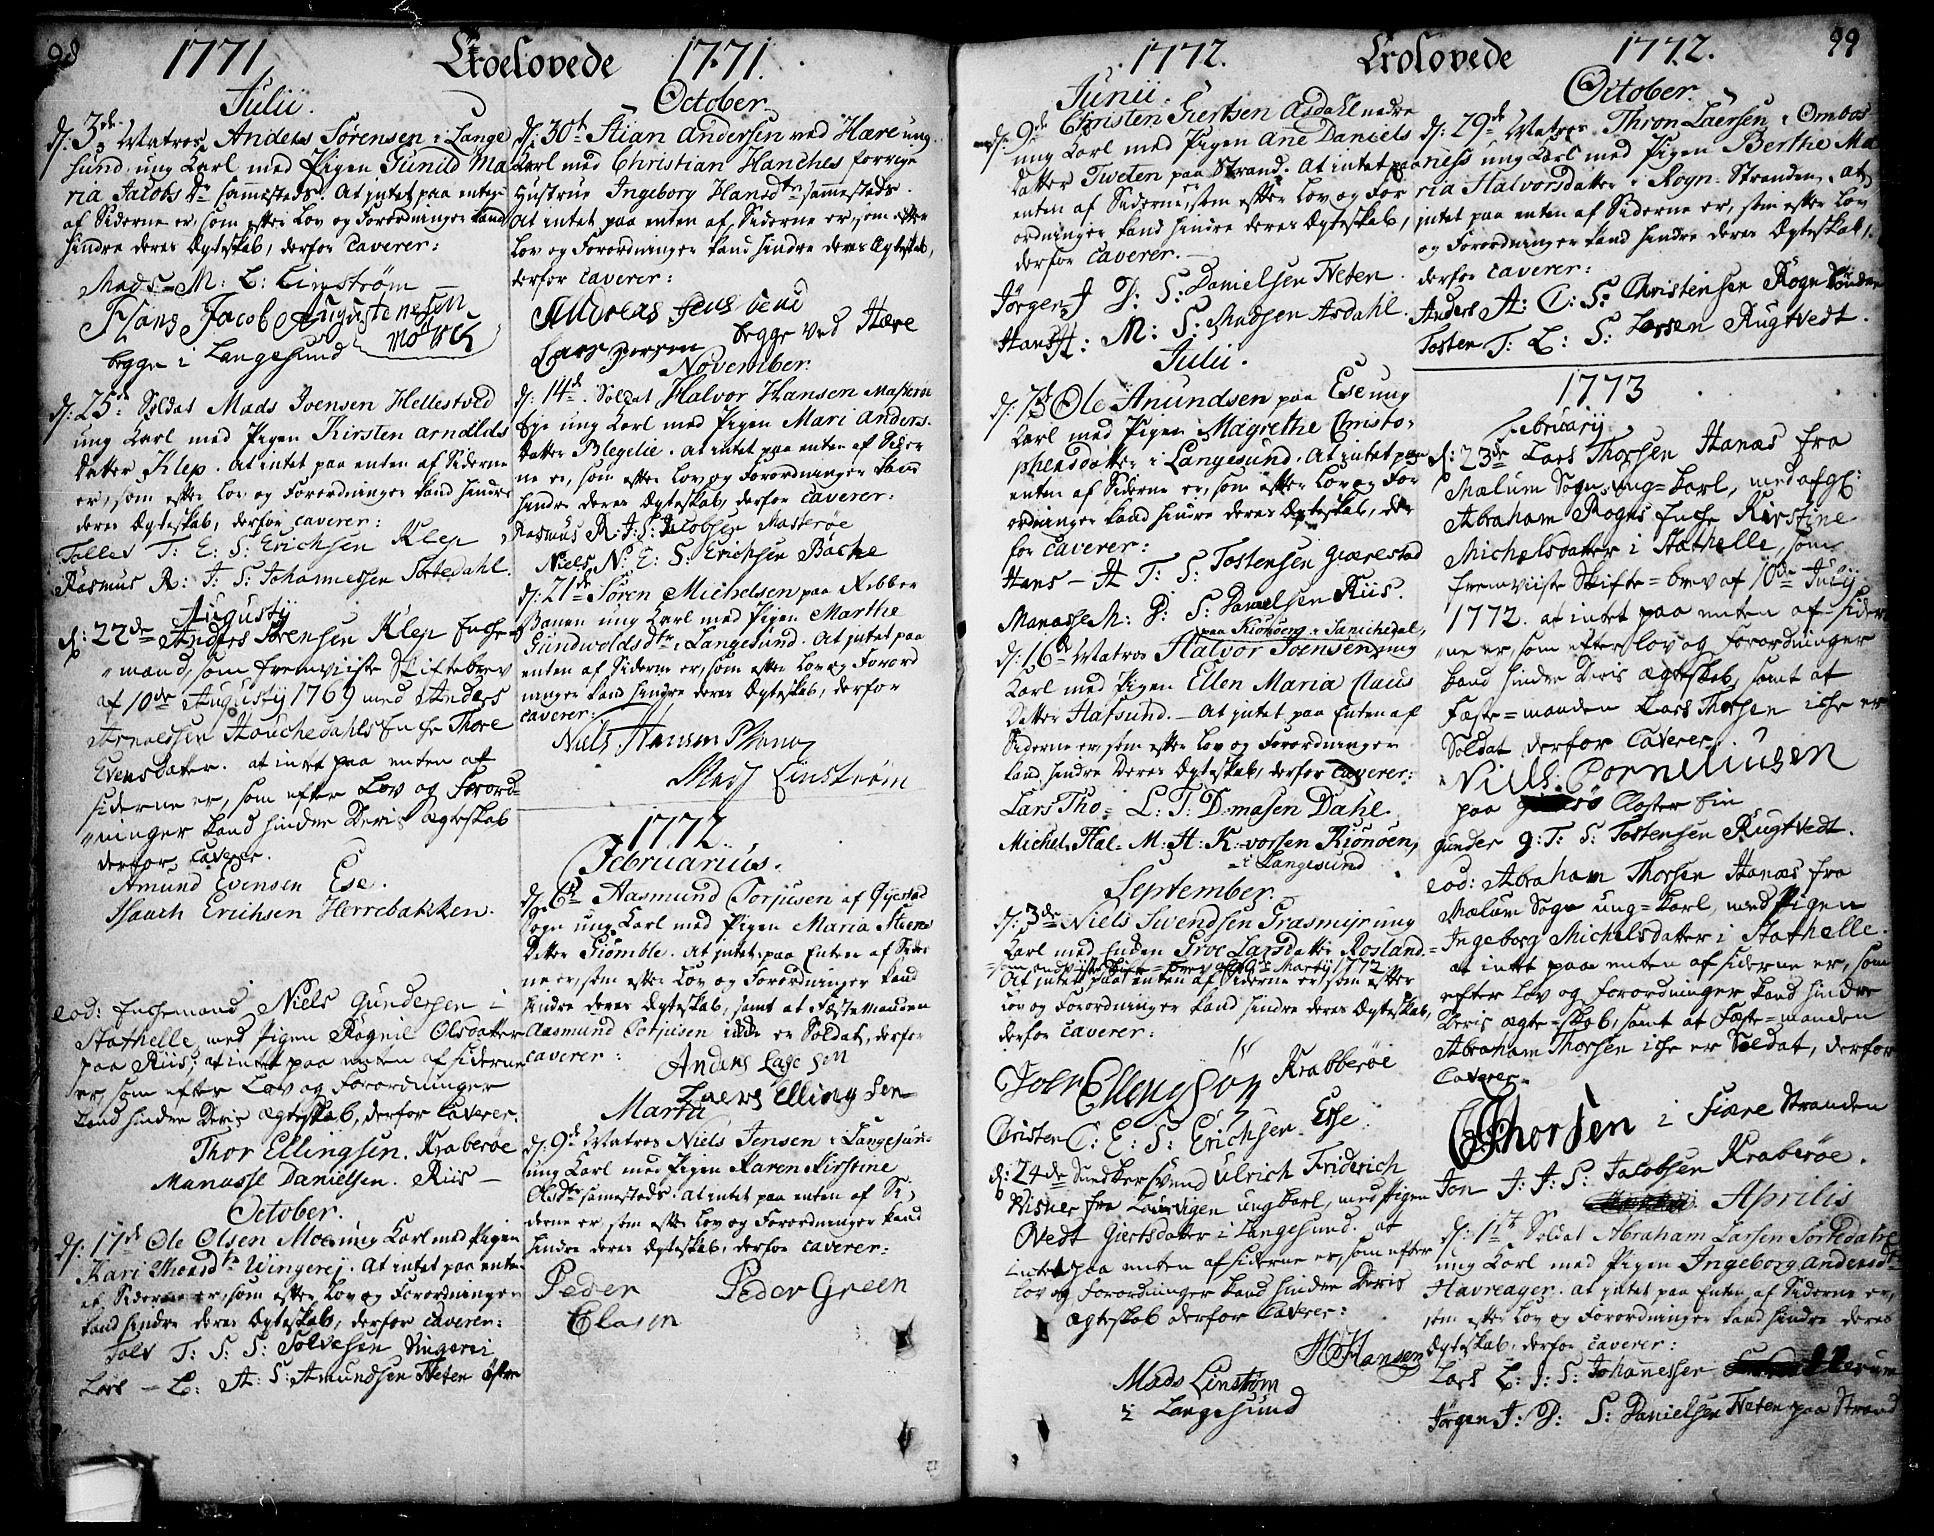 SAKO, Bamble kirkebøker, F/Fa/L0001: Ministerialbok nr. I 1, 1702-1774, s. 98-99